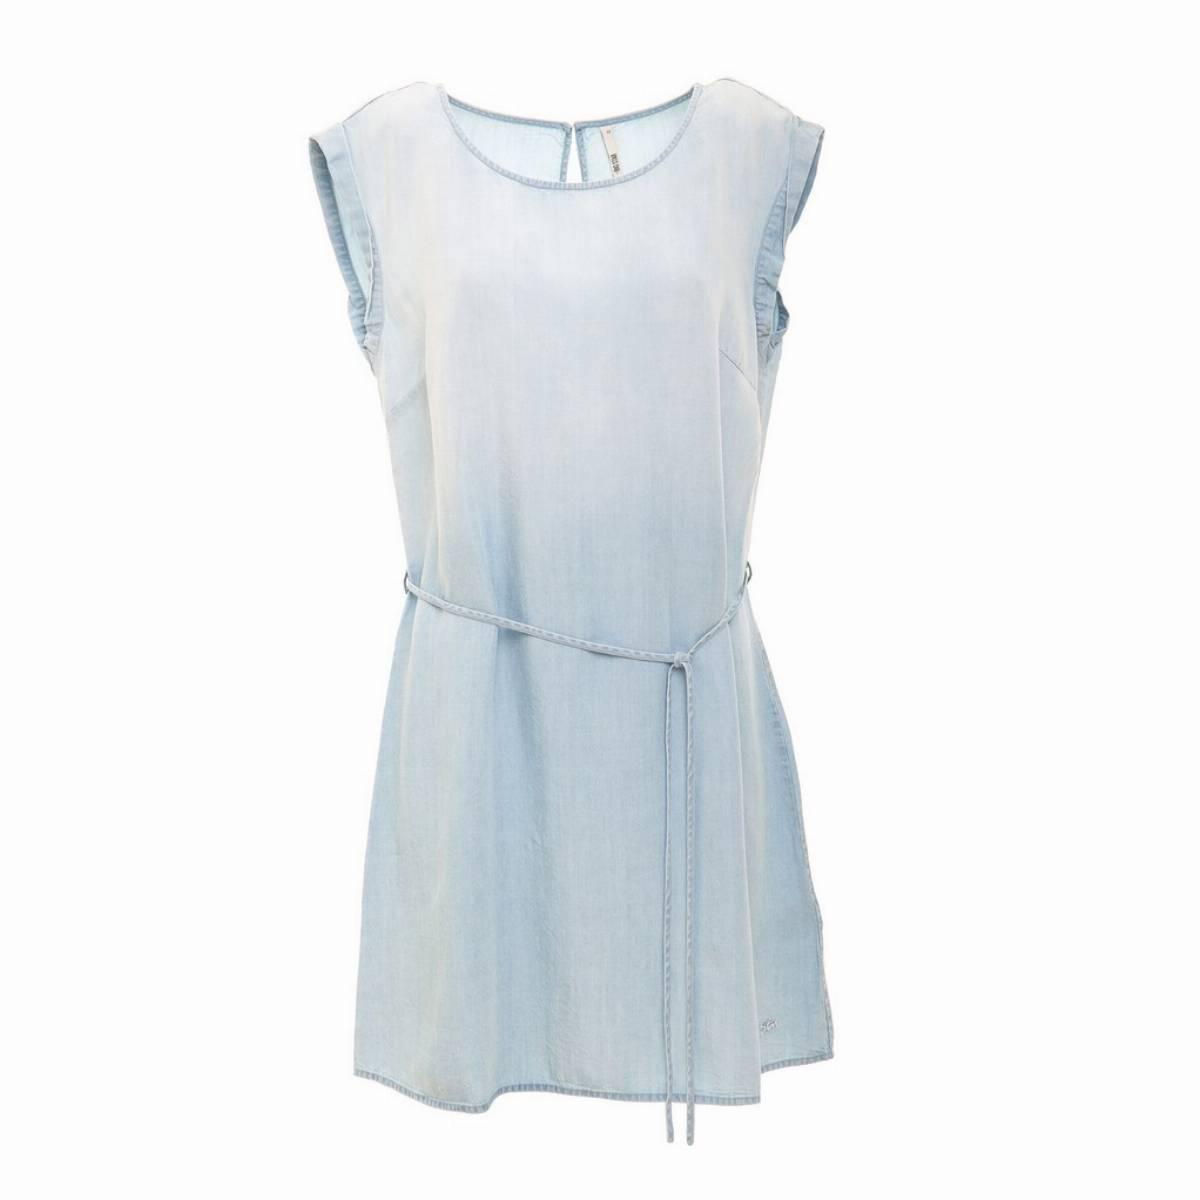 BIG_STAR_SS16_surade_dress_103,92PLN